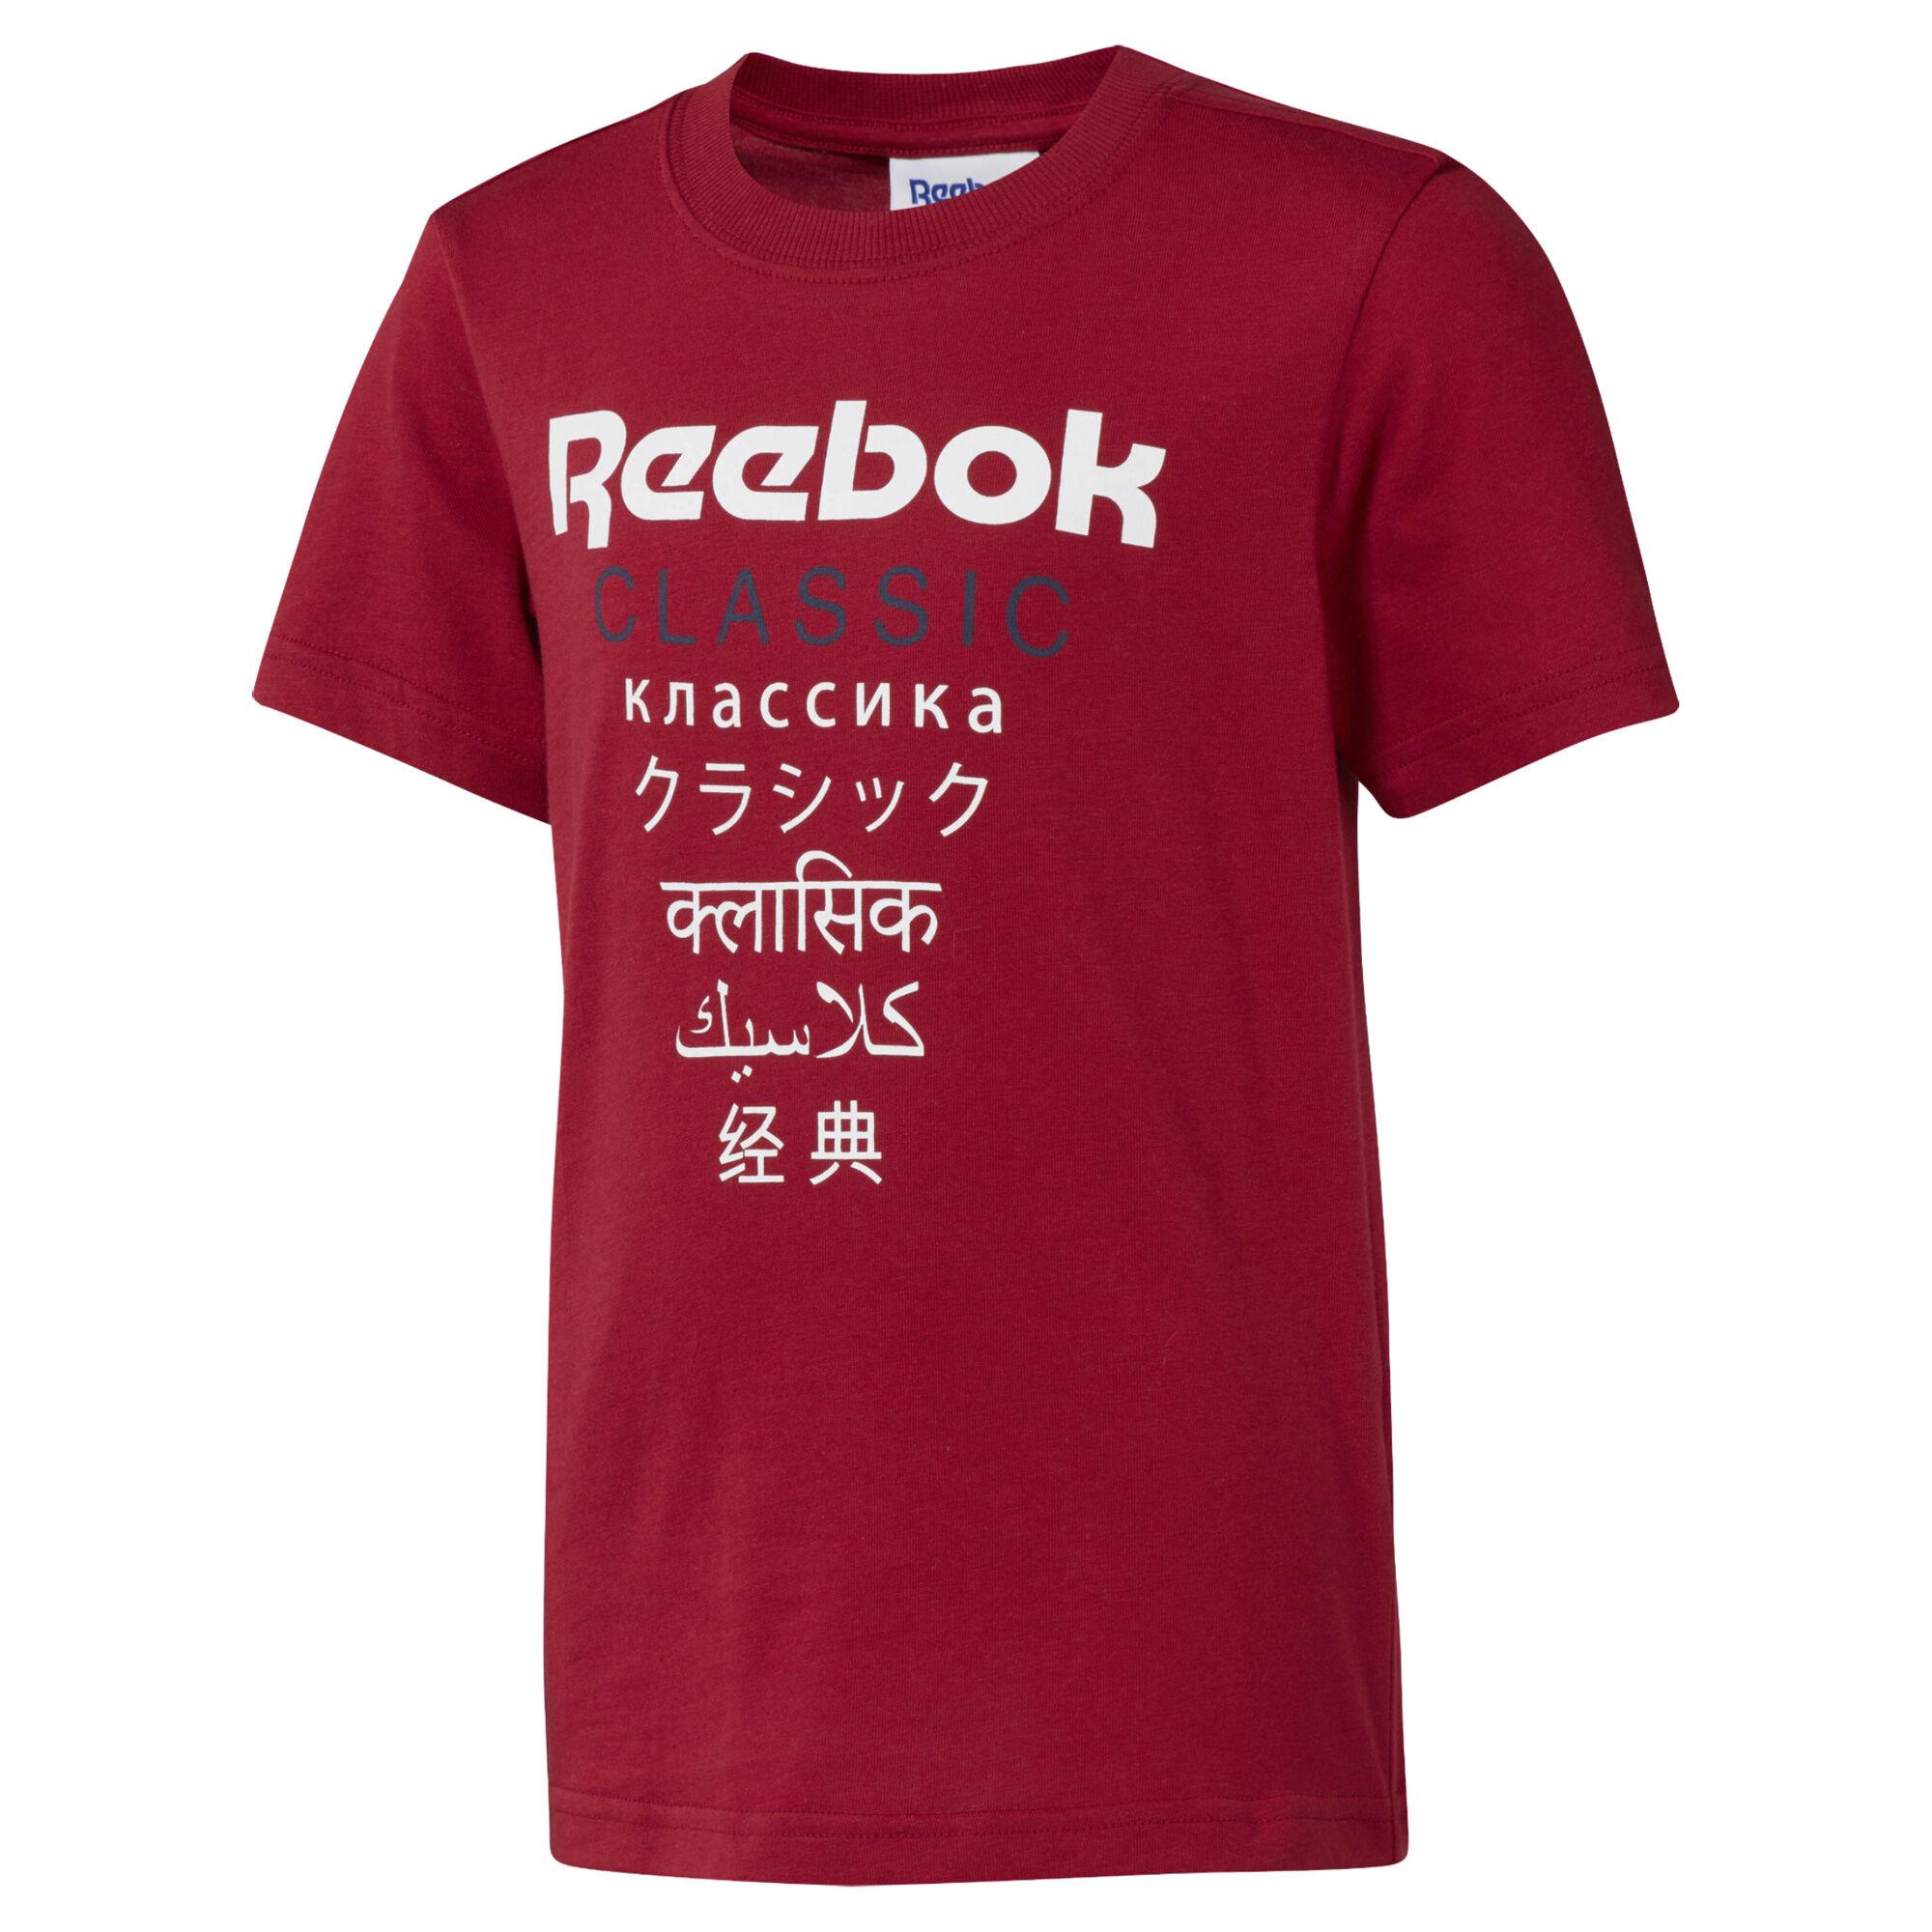 Reebok Unisex Classics Graphic T-Shirt - Grey | Reebok MLT